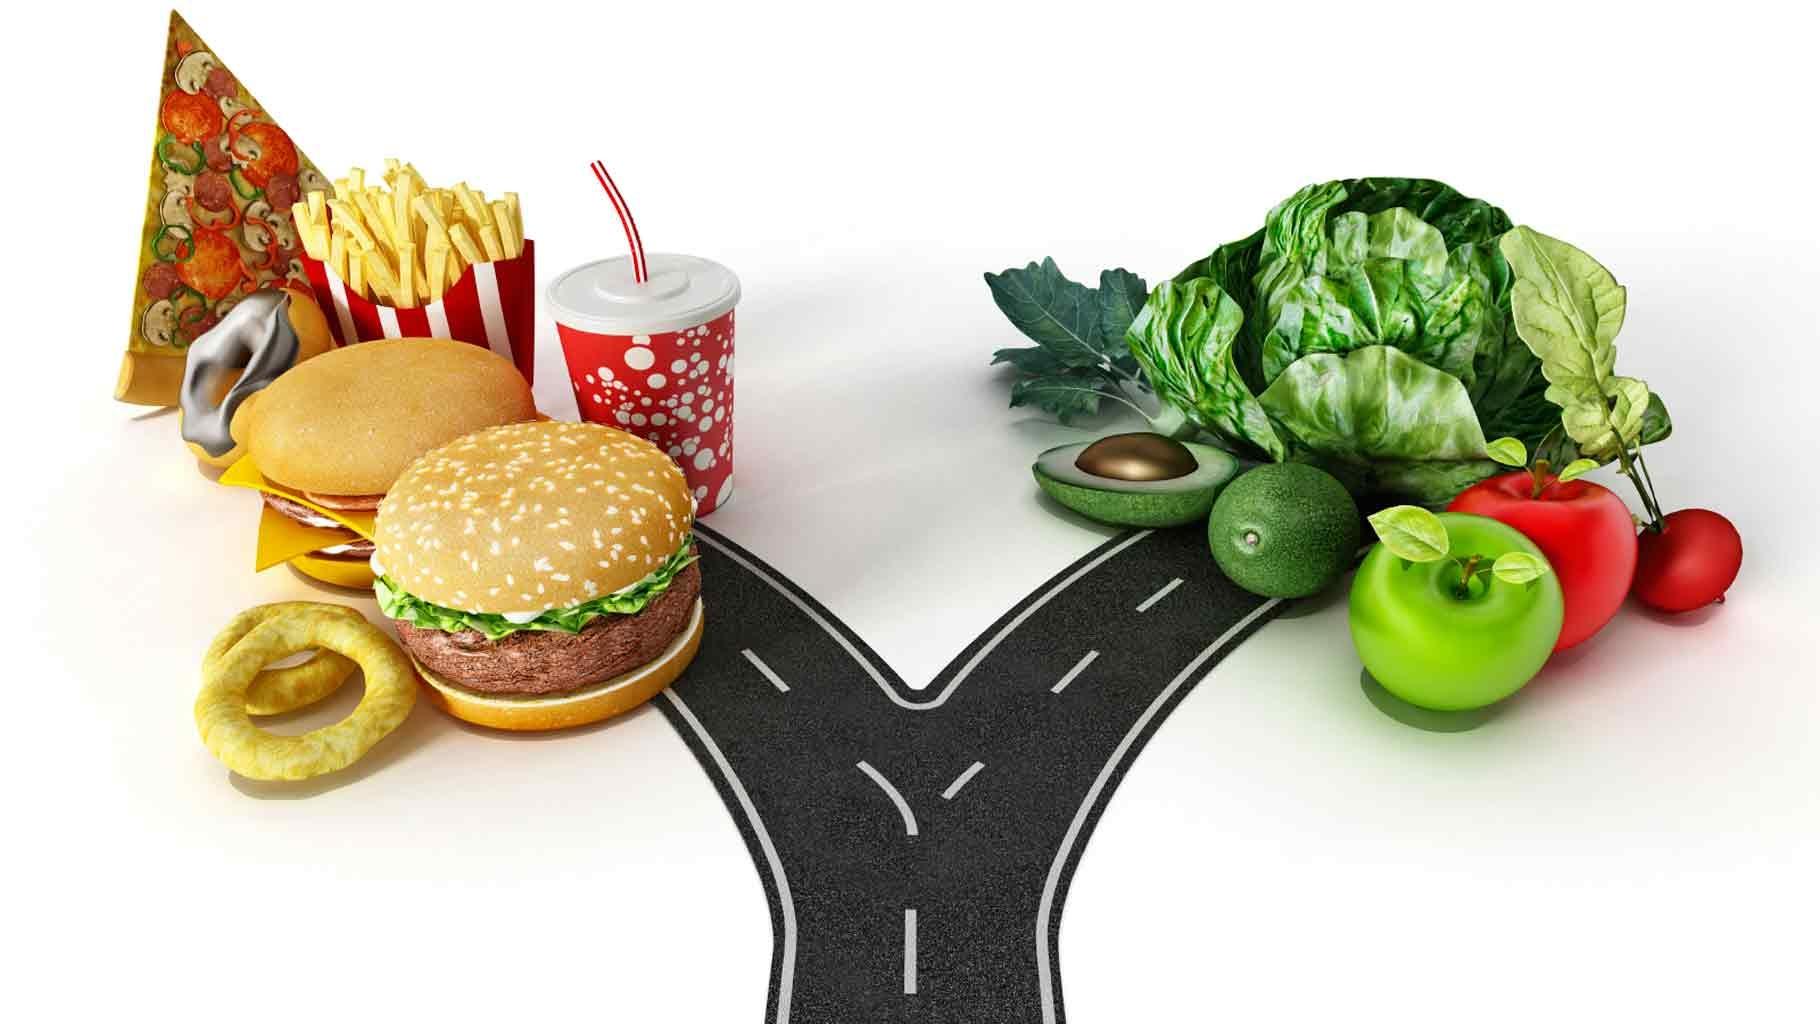 https://images.assettype.com/thequint/2016-05/4a7975e5-3b29-45bf-a8a7-e6d94cc6d96f/300-calories-hi.jpg